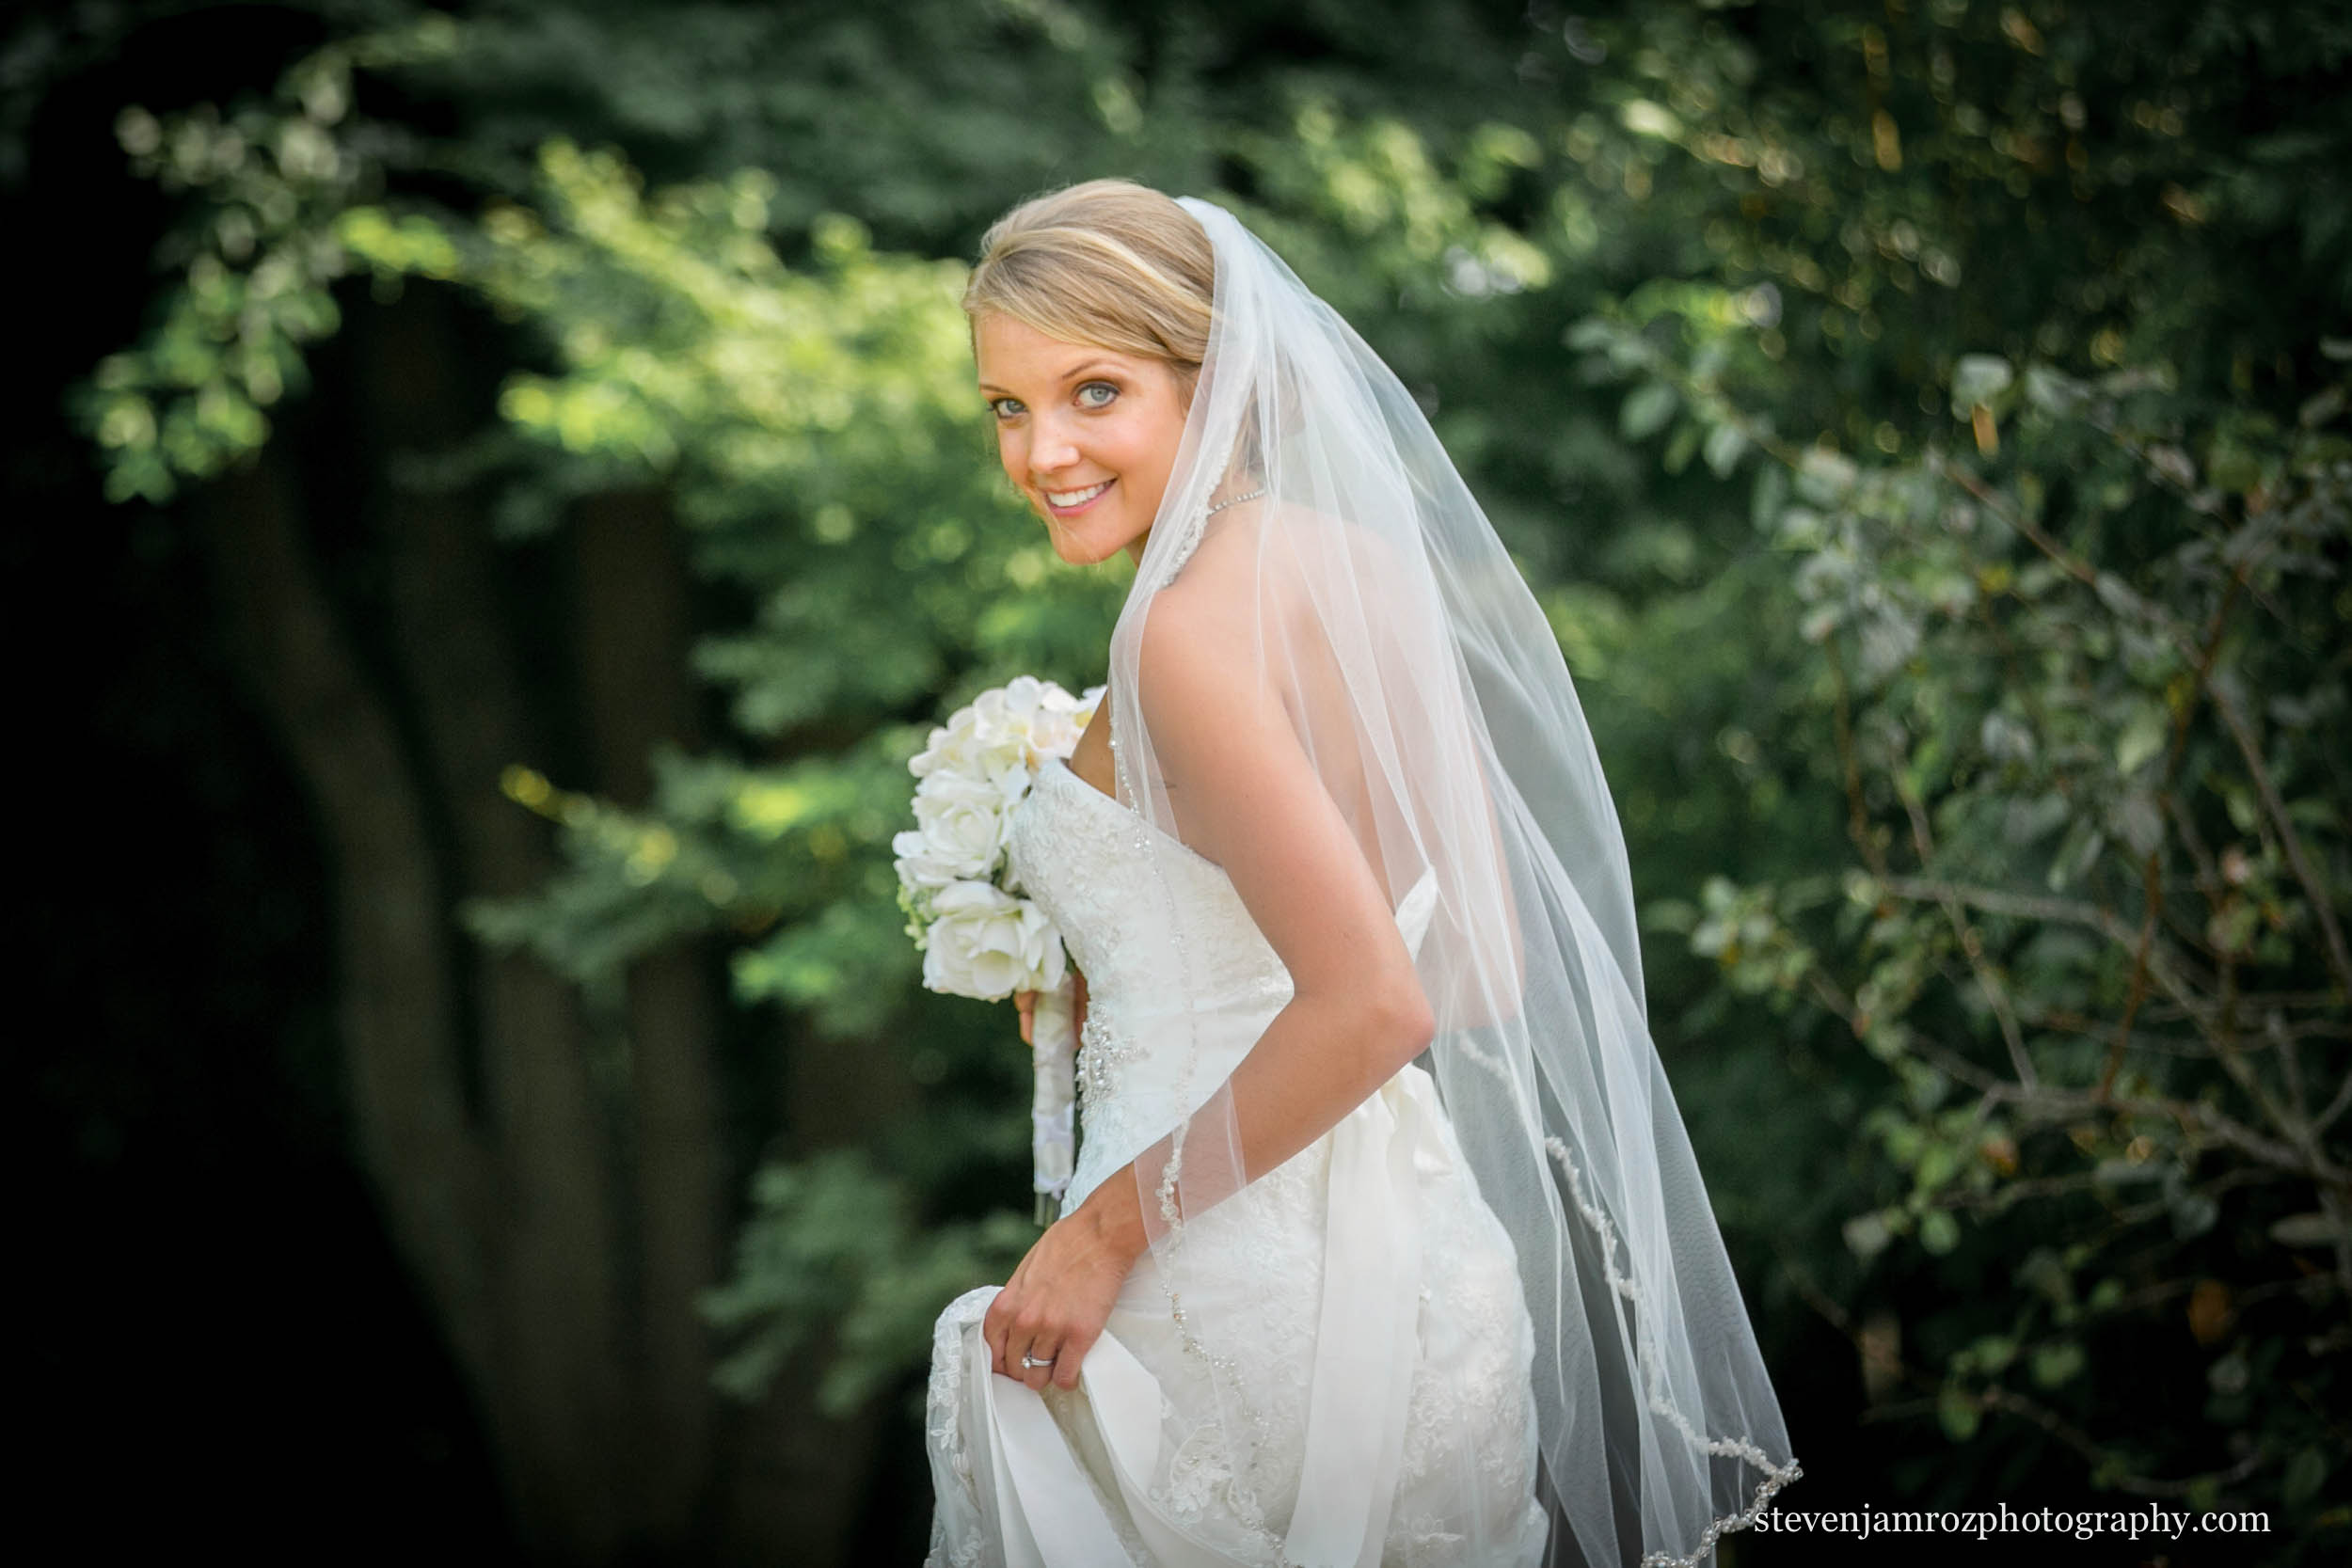 bridal-portrait-jc-raulston-nc-state-photographer-steven-jamroz-0659.jpg